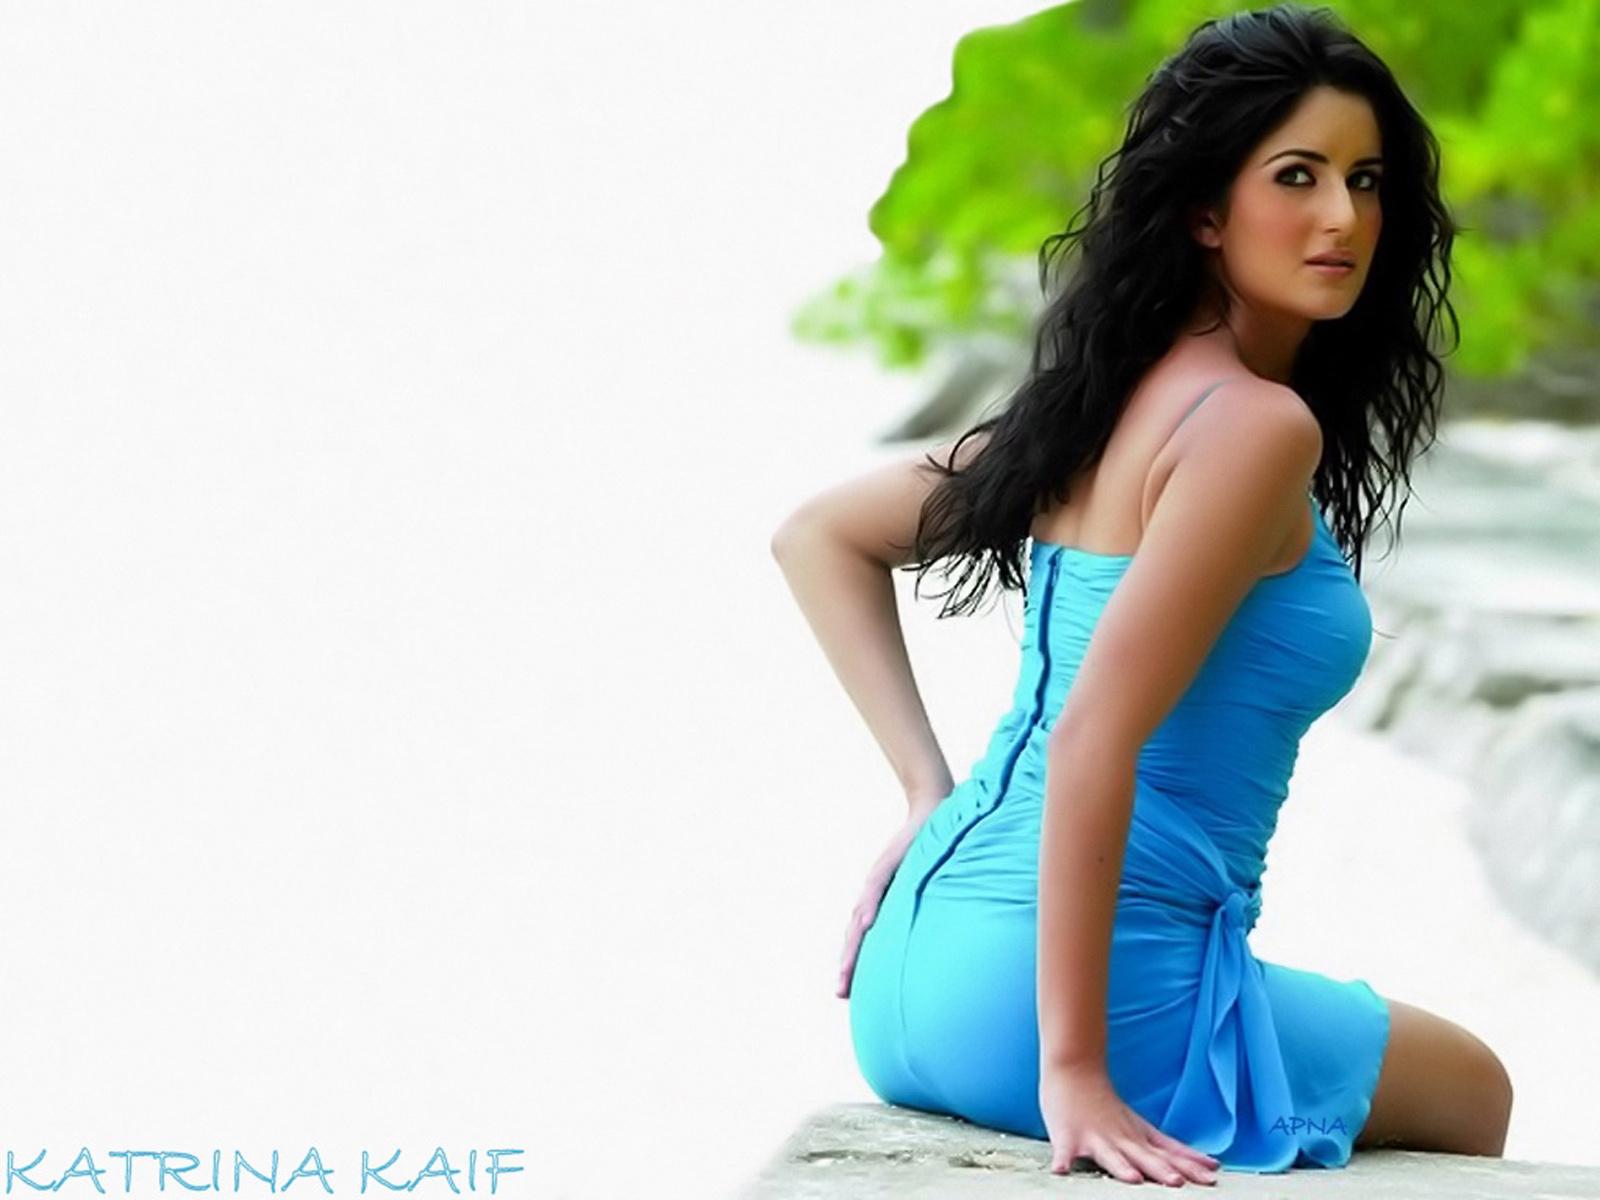 Katrina Kaif Hot Unseen Photos Leaked ~ WoodmanduFashion.com